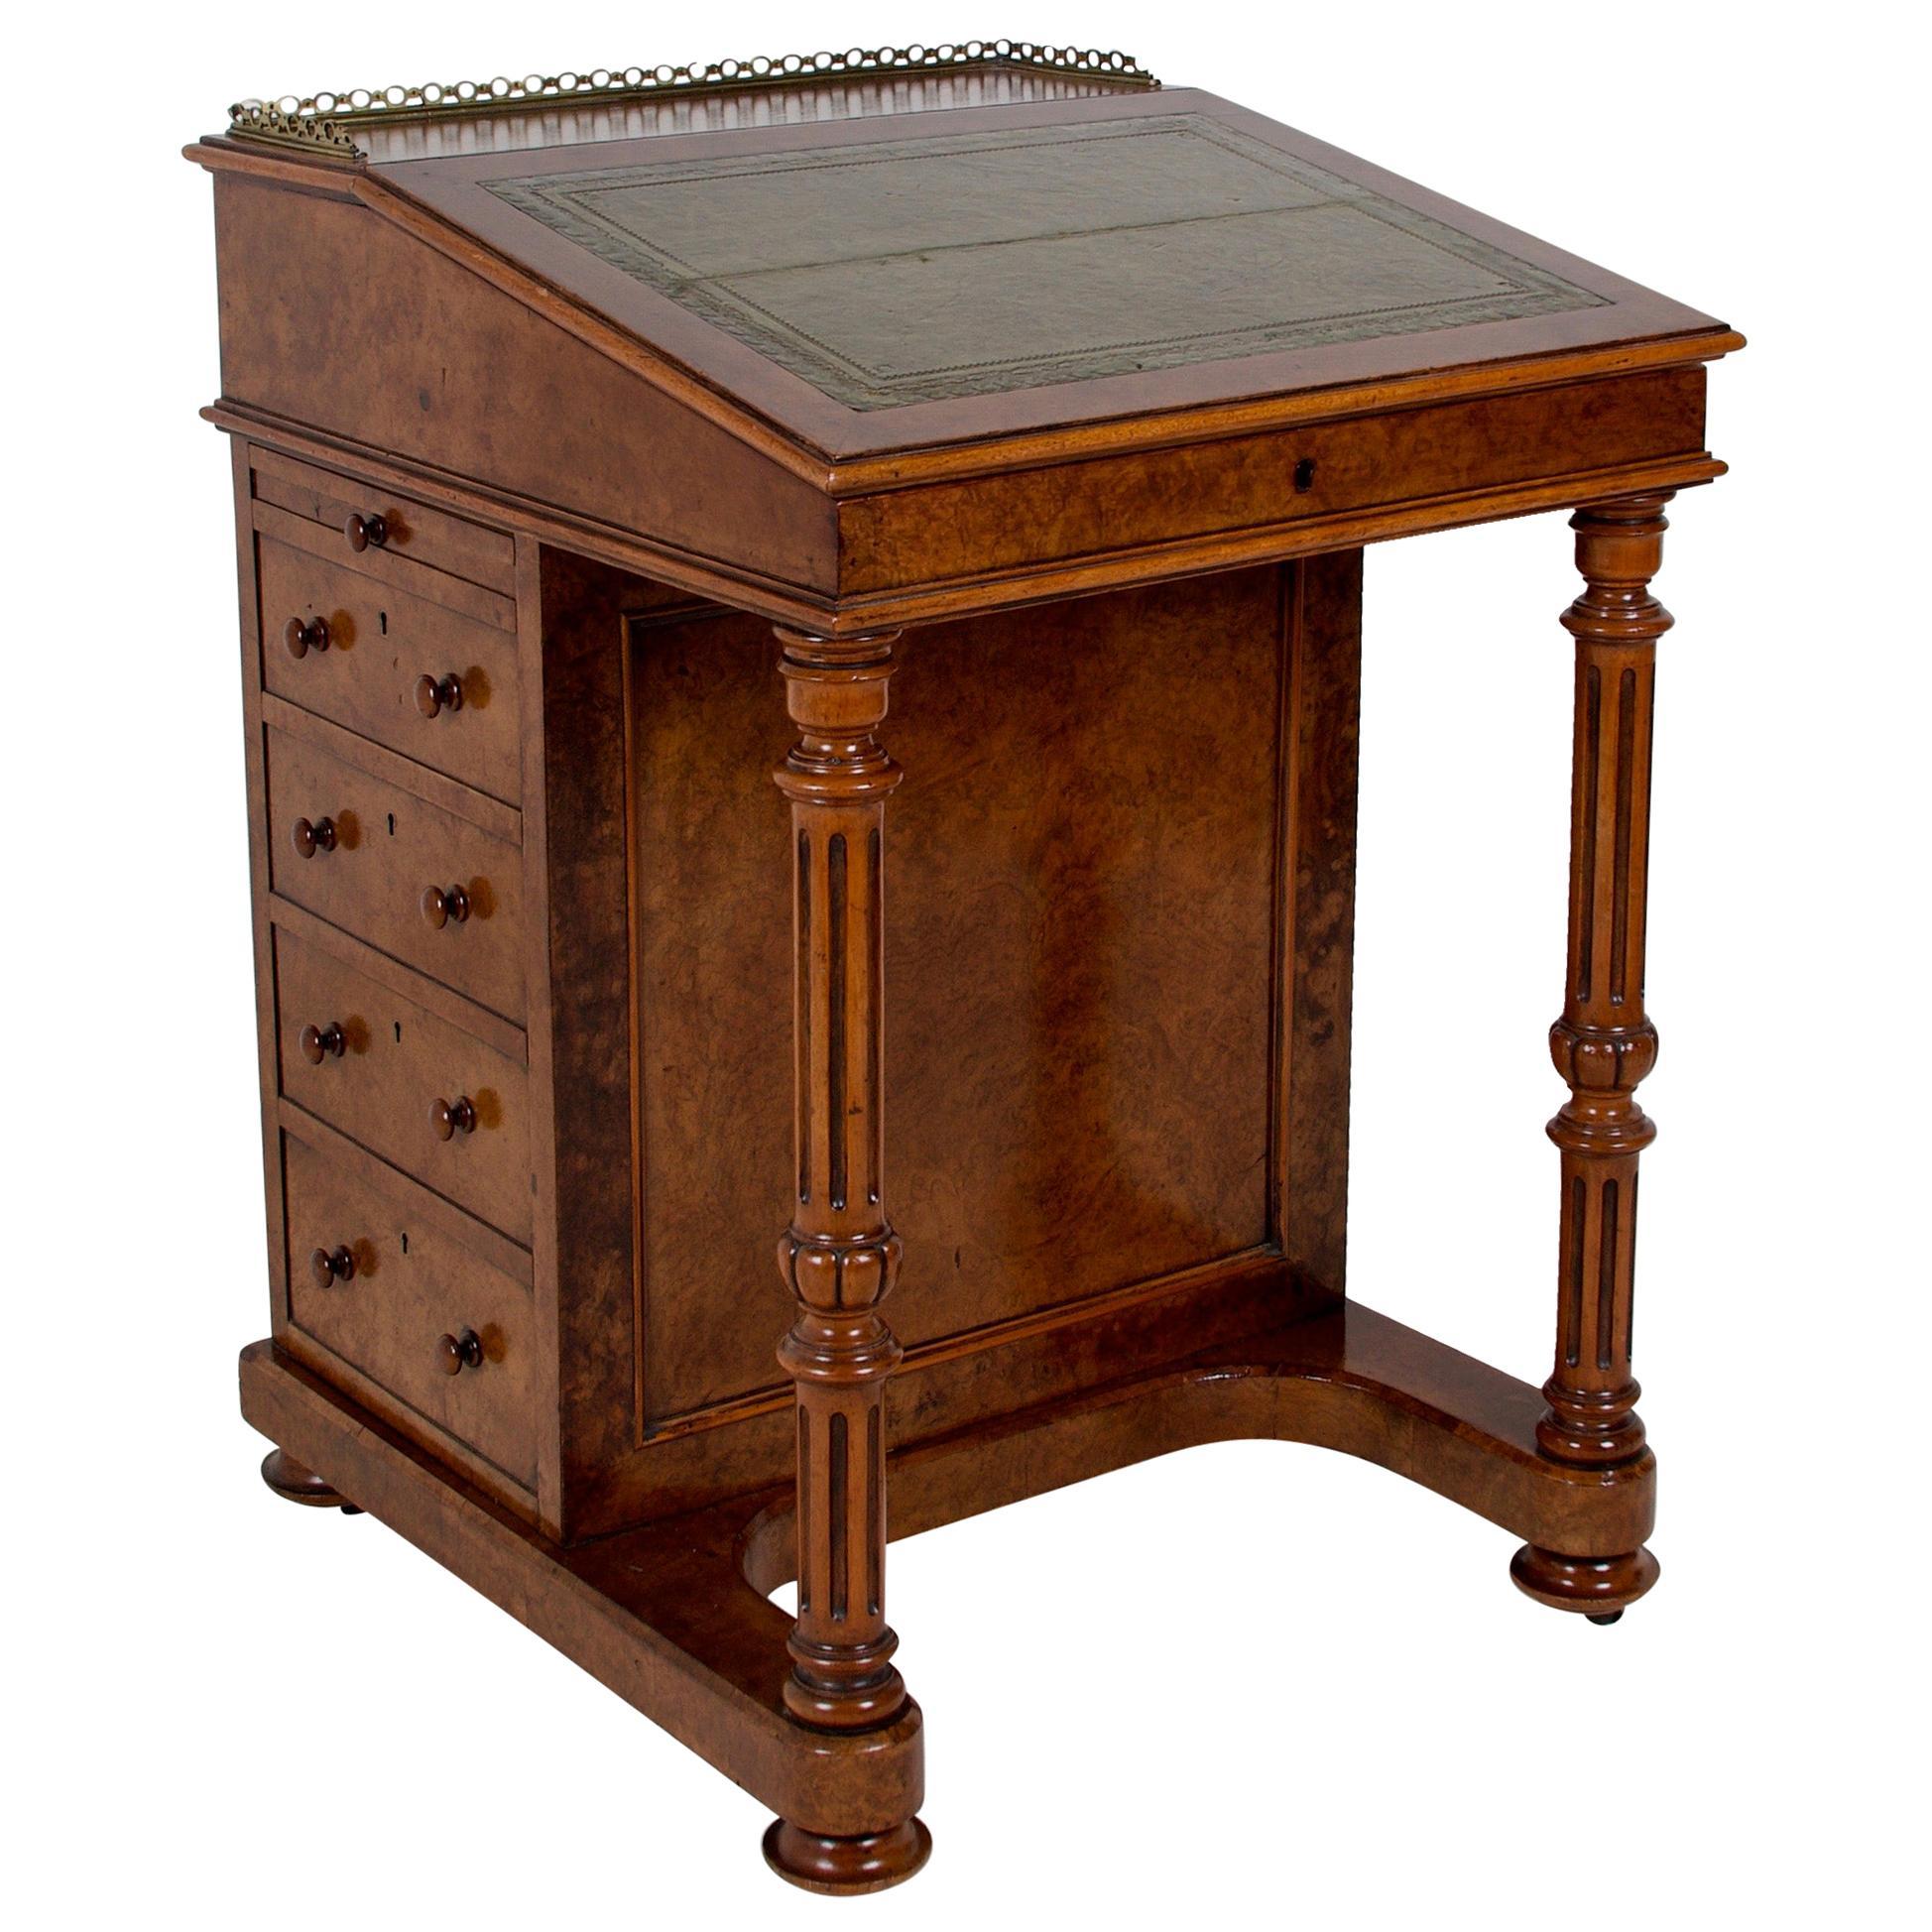 Mid-19th Century Davenport Desk in Walnut Burl, Satinwood and Ebony